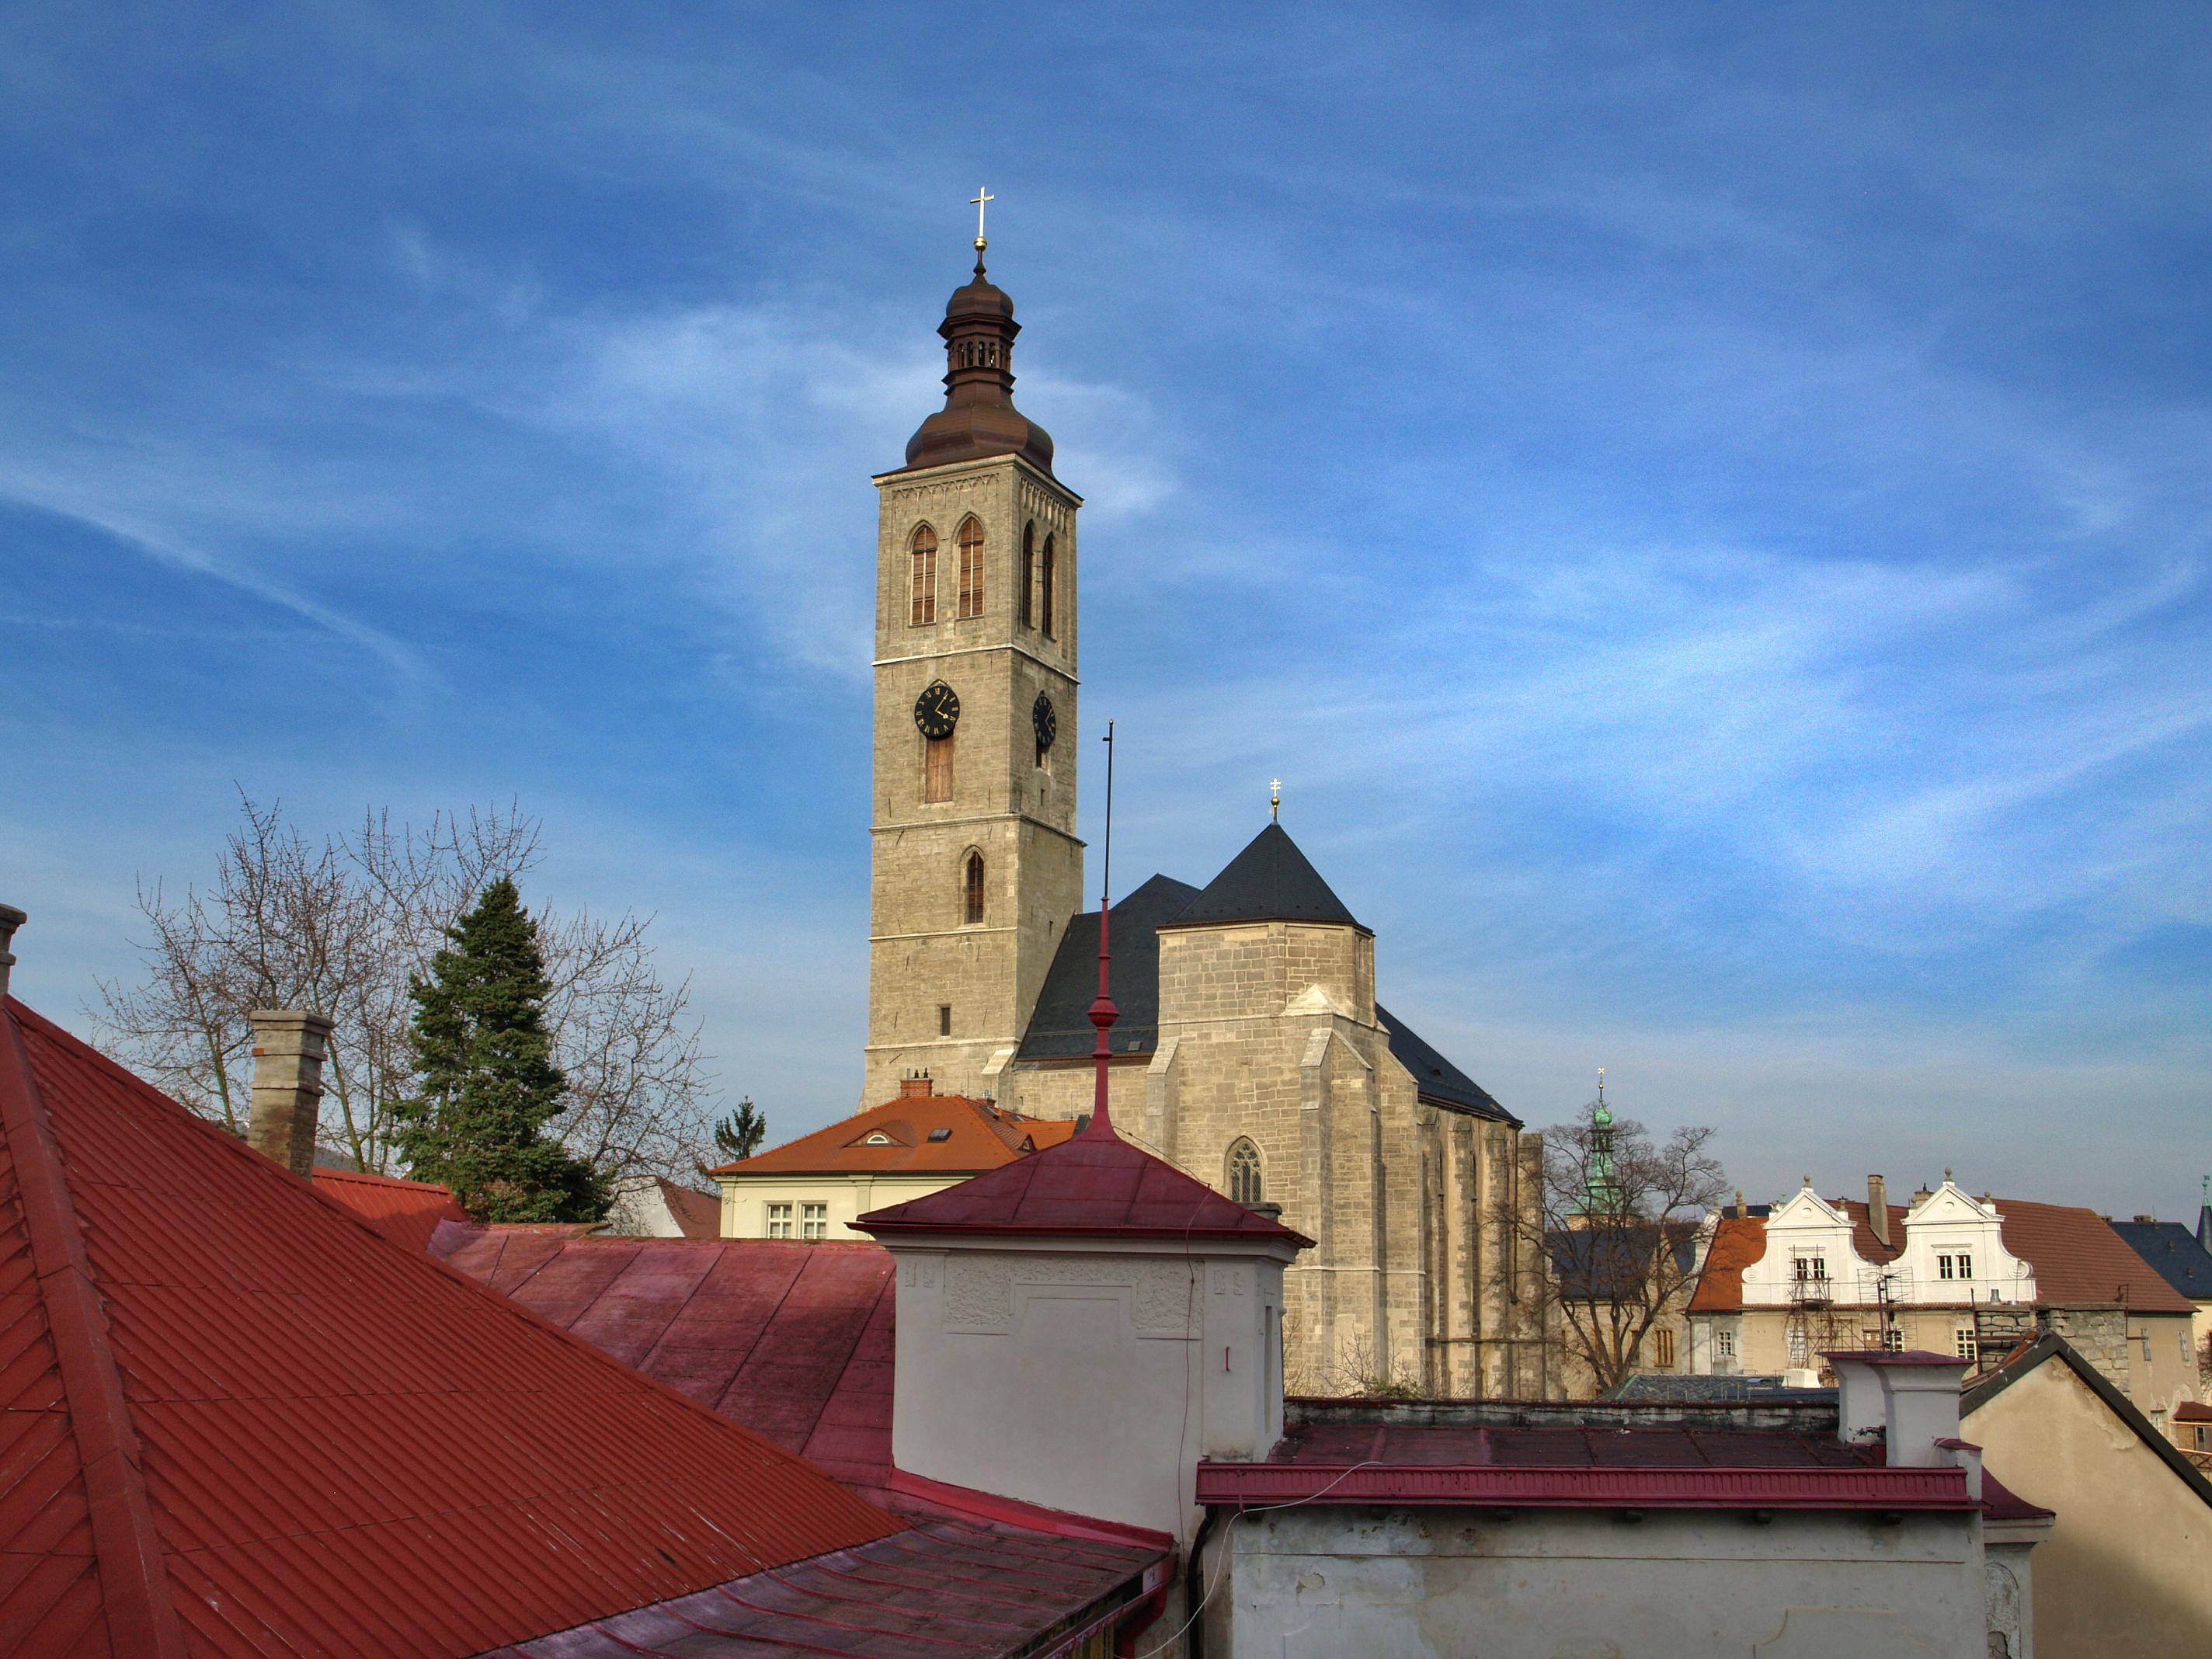 6207-kostel-sv-jakuba-st-james-church-2.jpg